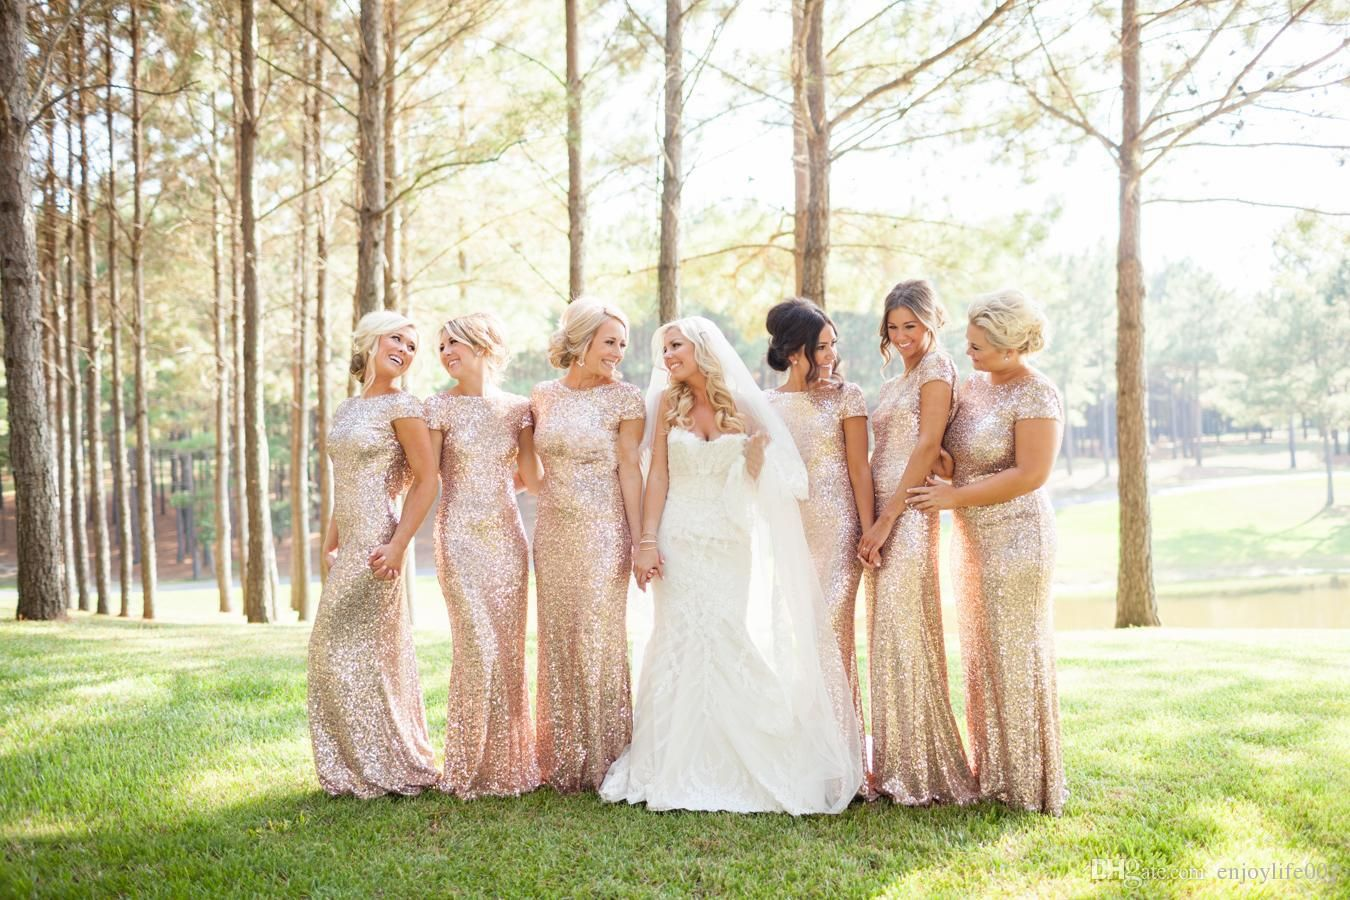 2d6faad7ef3 Sparkly Rose Gold Cheap 2016 Mermaid Bridesmaid Dresses 2016 Short Sleeve  Sequins Backless Long Beach Wedding